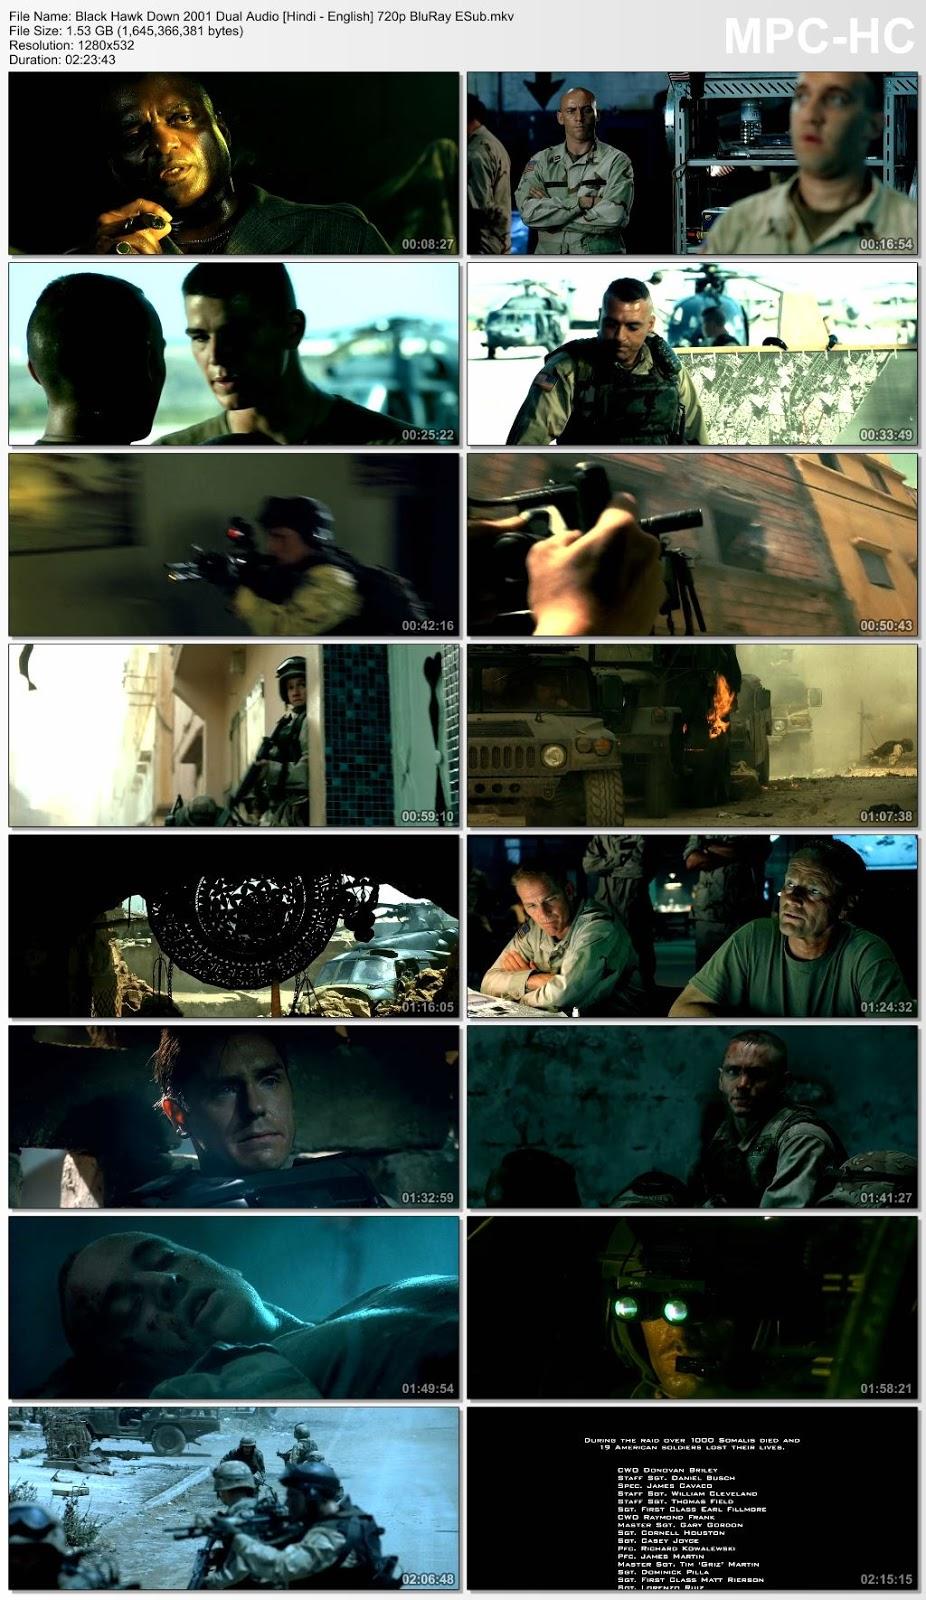 Black Hawk Down 2001 Dual Audio [Hindi – English] 720p BluRay ESub 1.5GB Desirehub